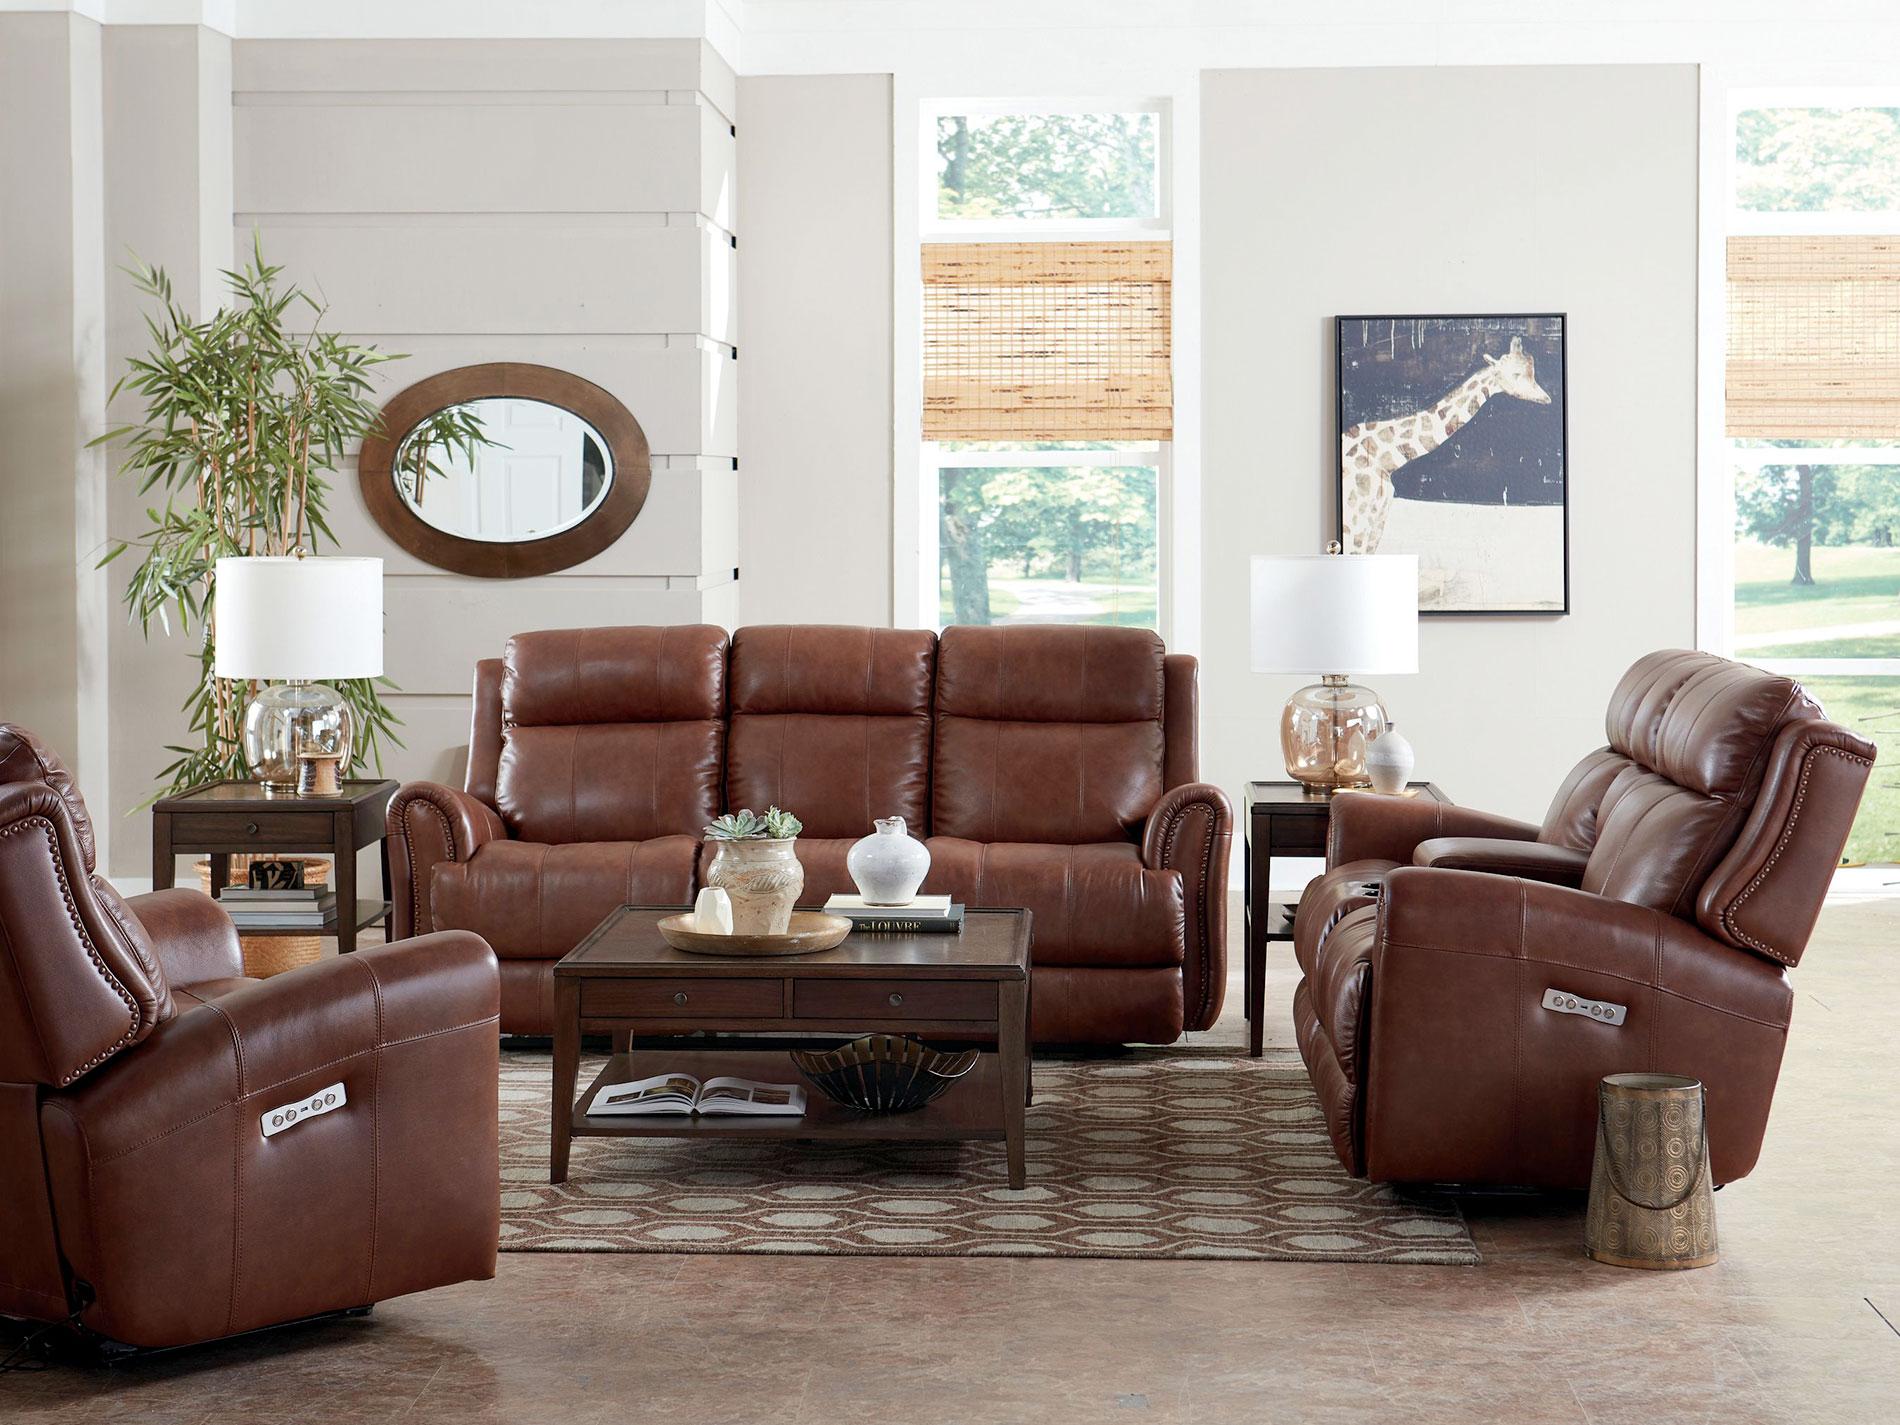 Superb Marquee Collection Of Club Chairs Sofas Bassett Machost Co Dining Chair Design Ideas Machostcouk